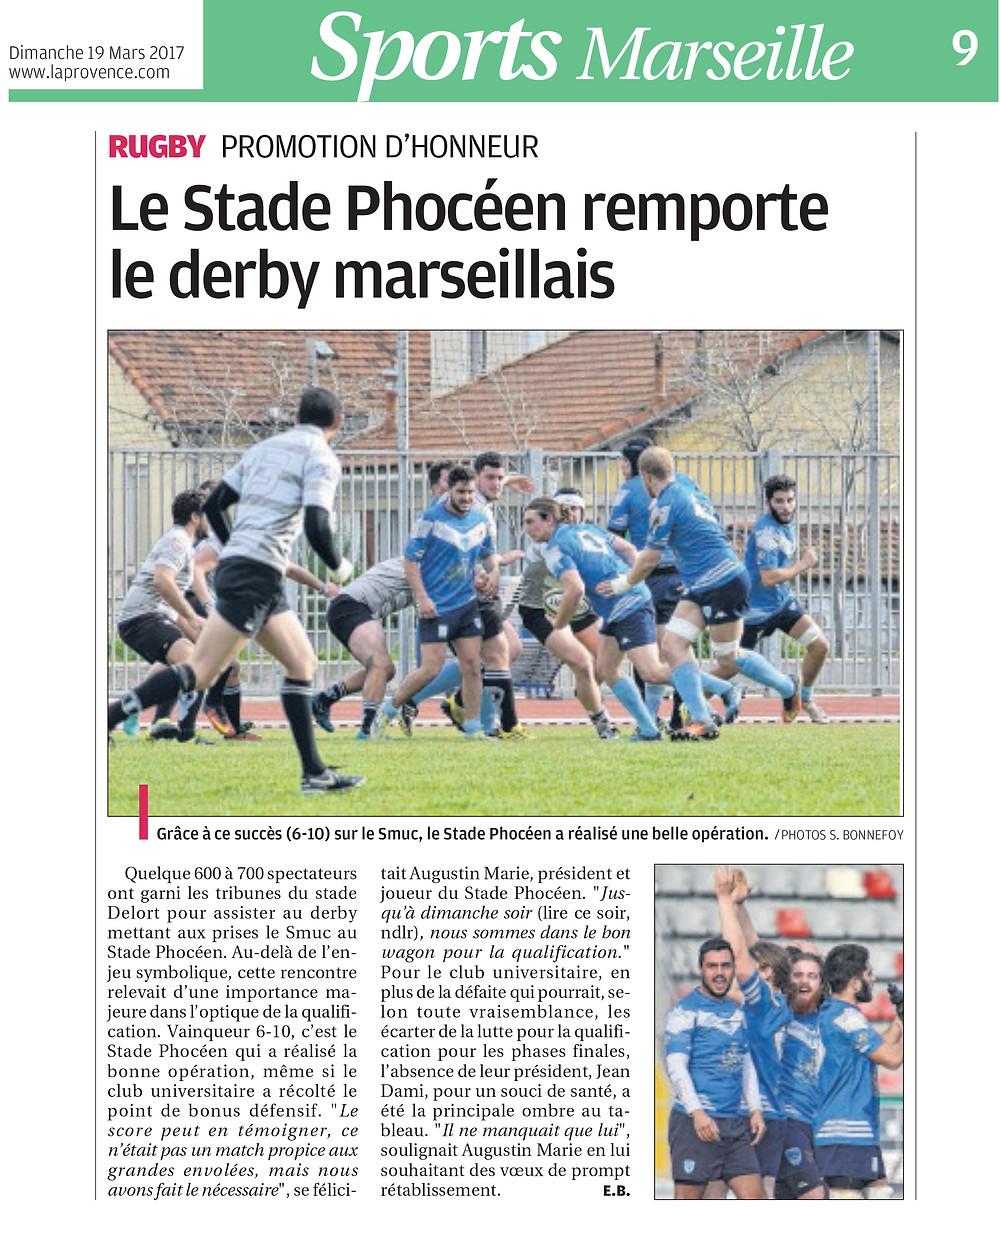 La provence - 19 03 2017 - RC Stade Phoceen